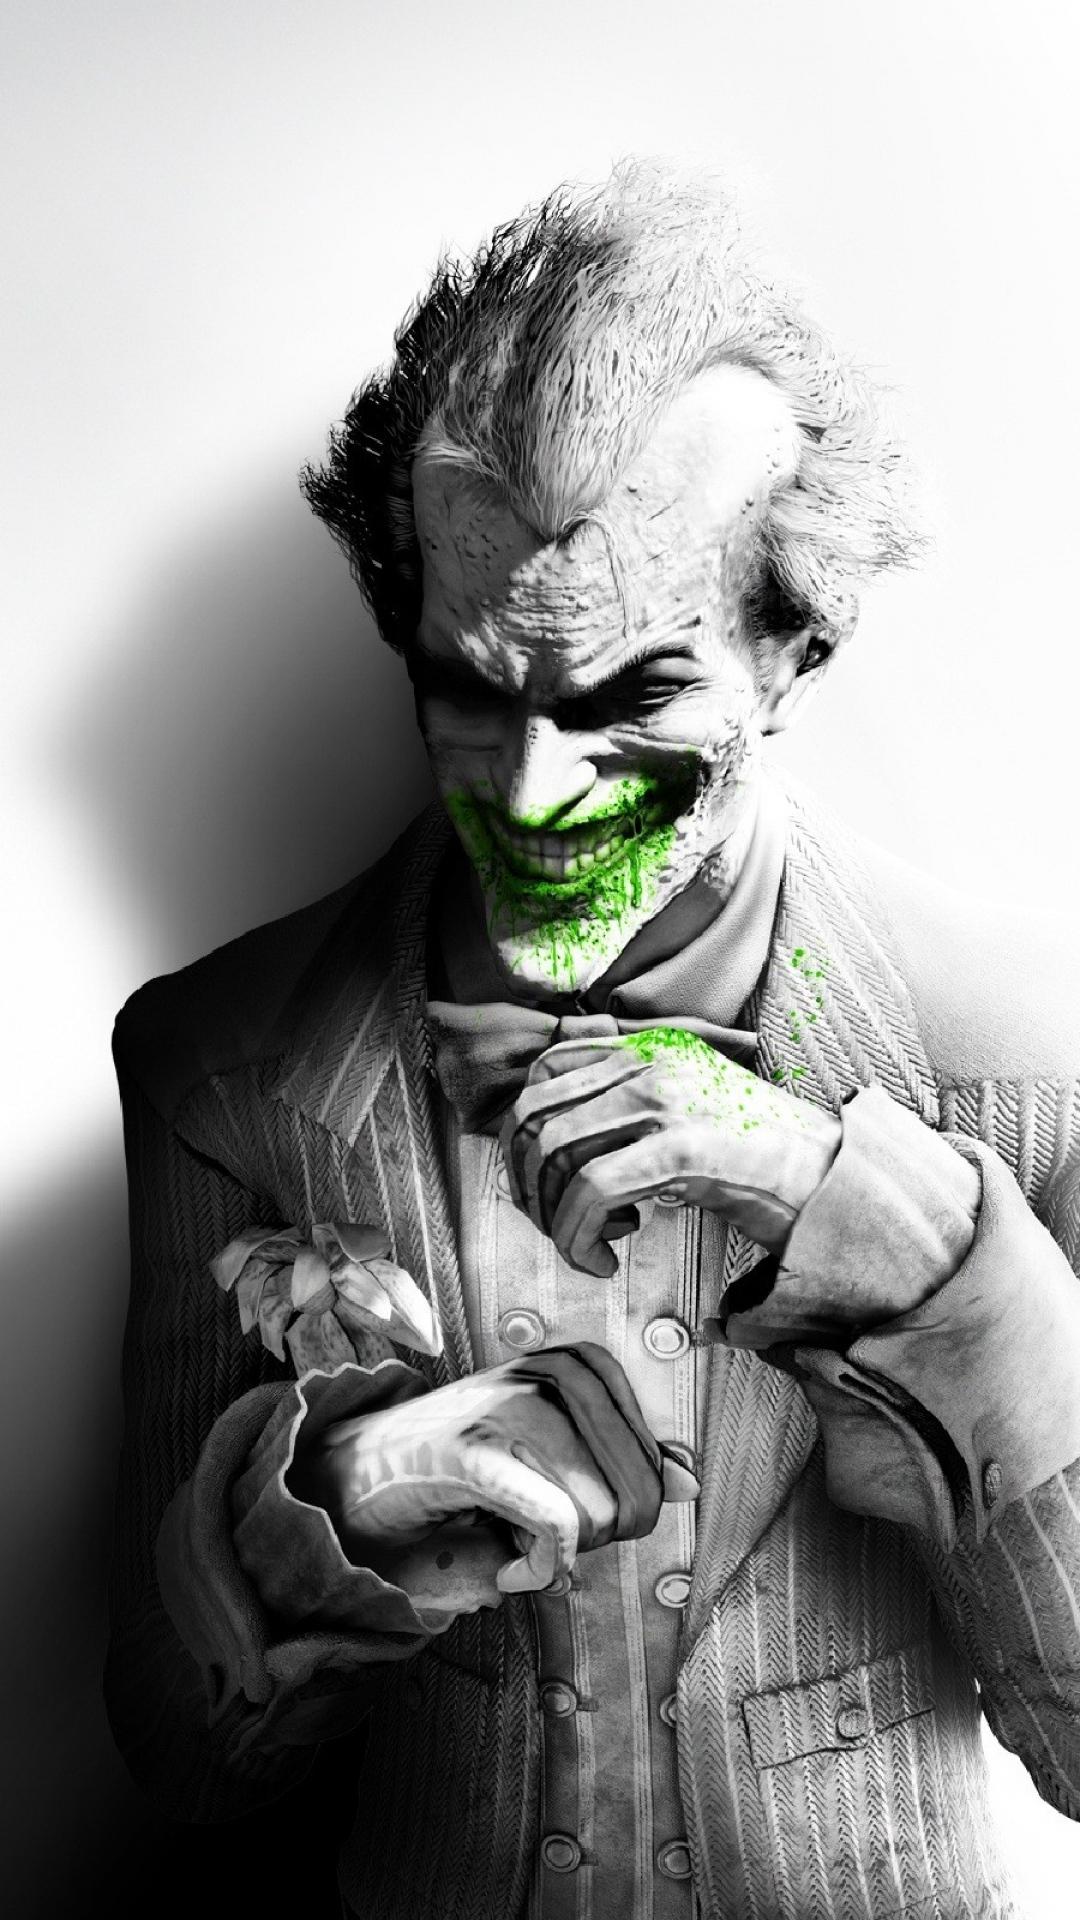 1080x1920-batman-arkham-city-joker-smile-suit-flower-fan-art-black-and-white-wallpaper-wpc900487